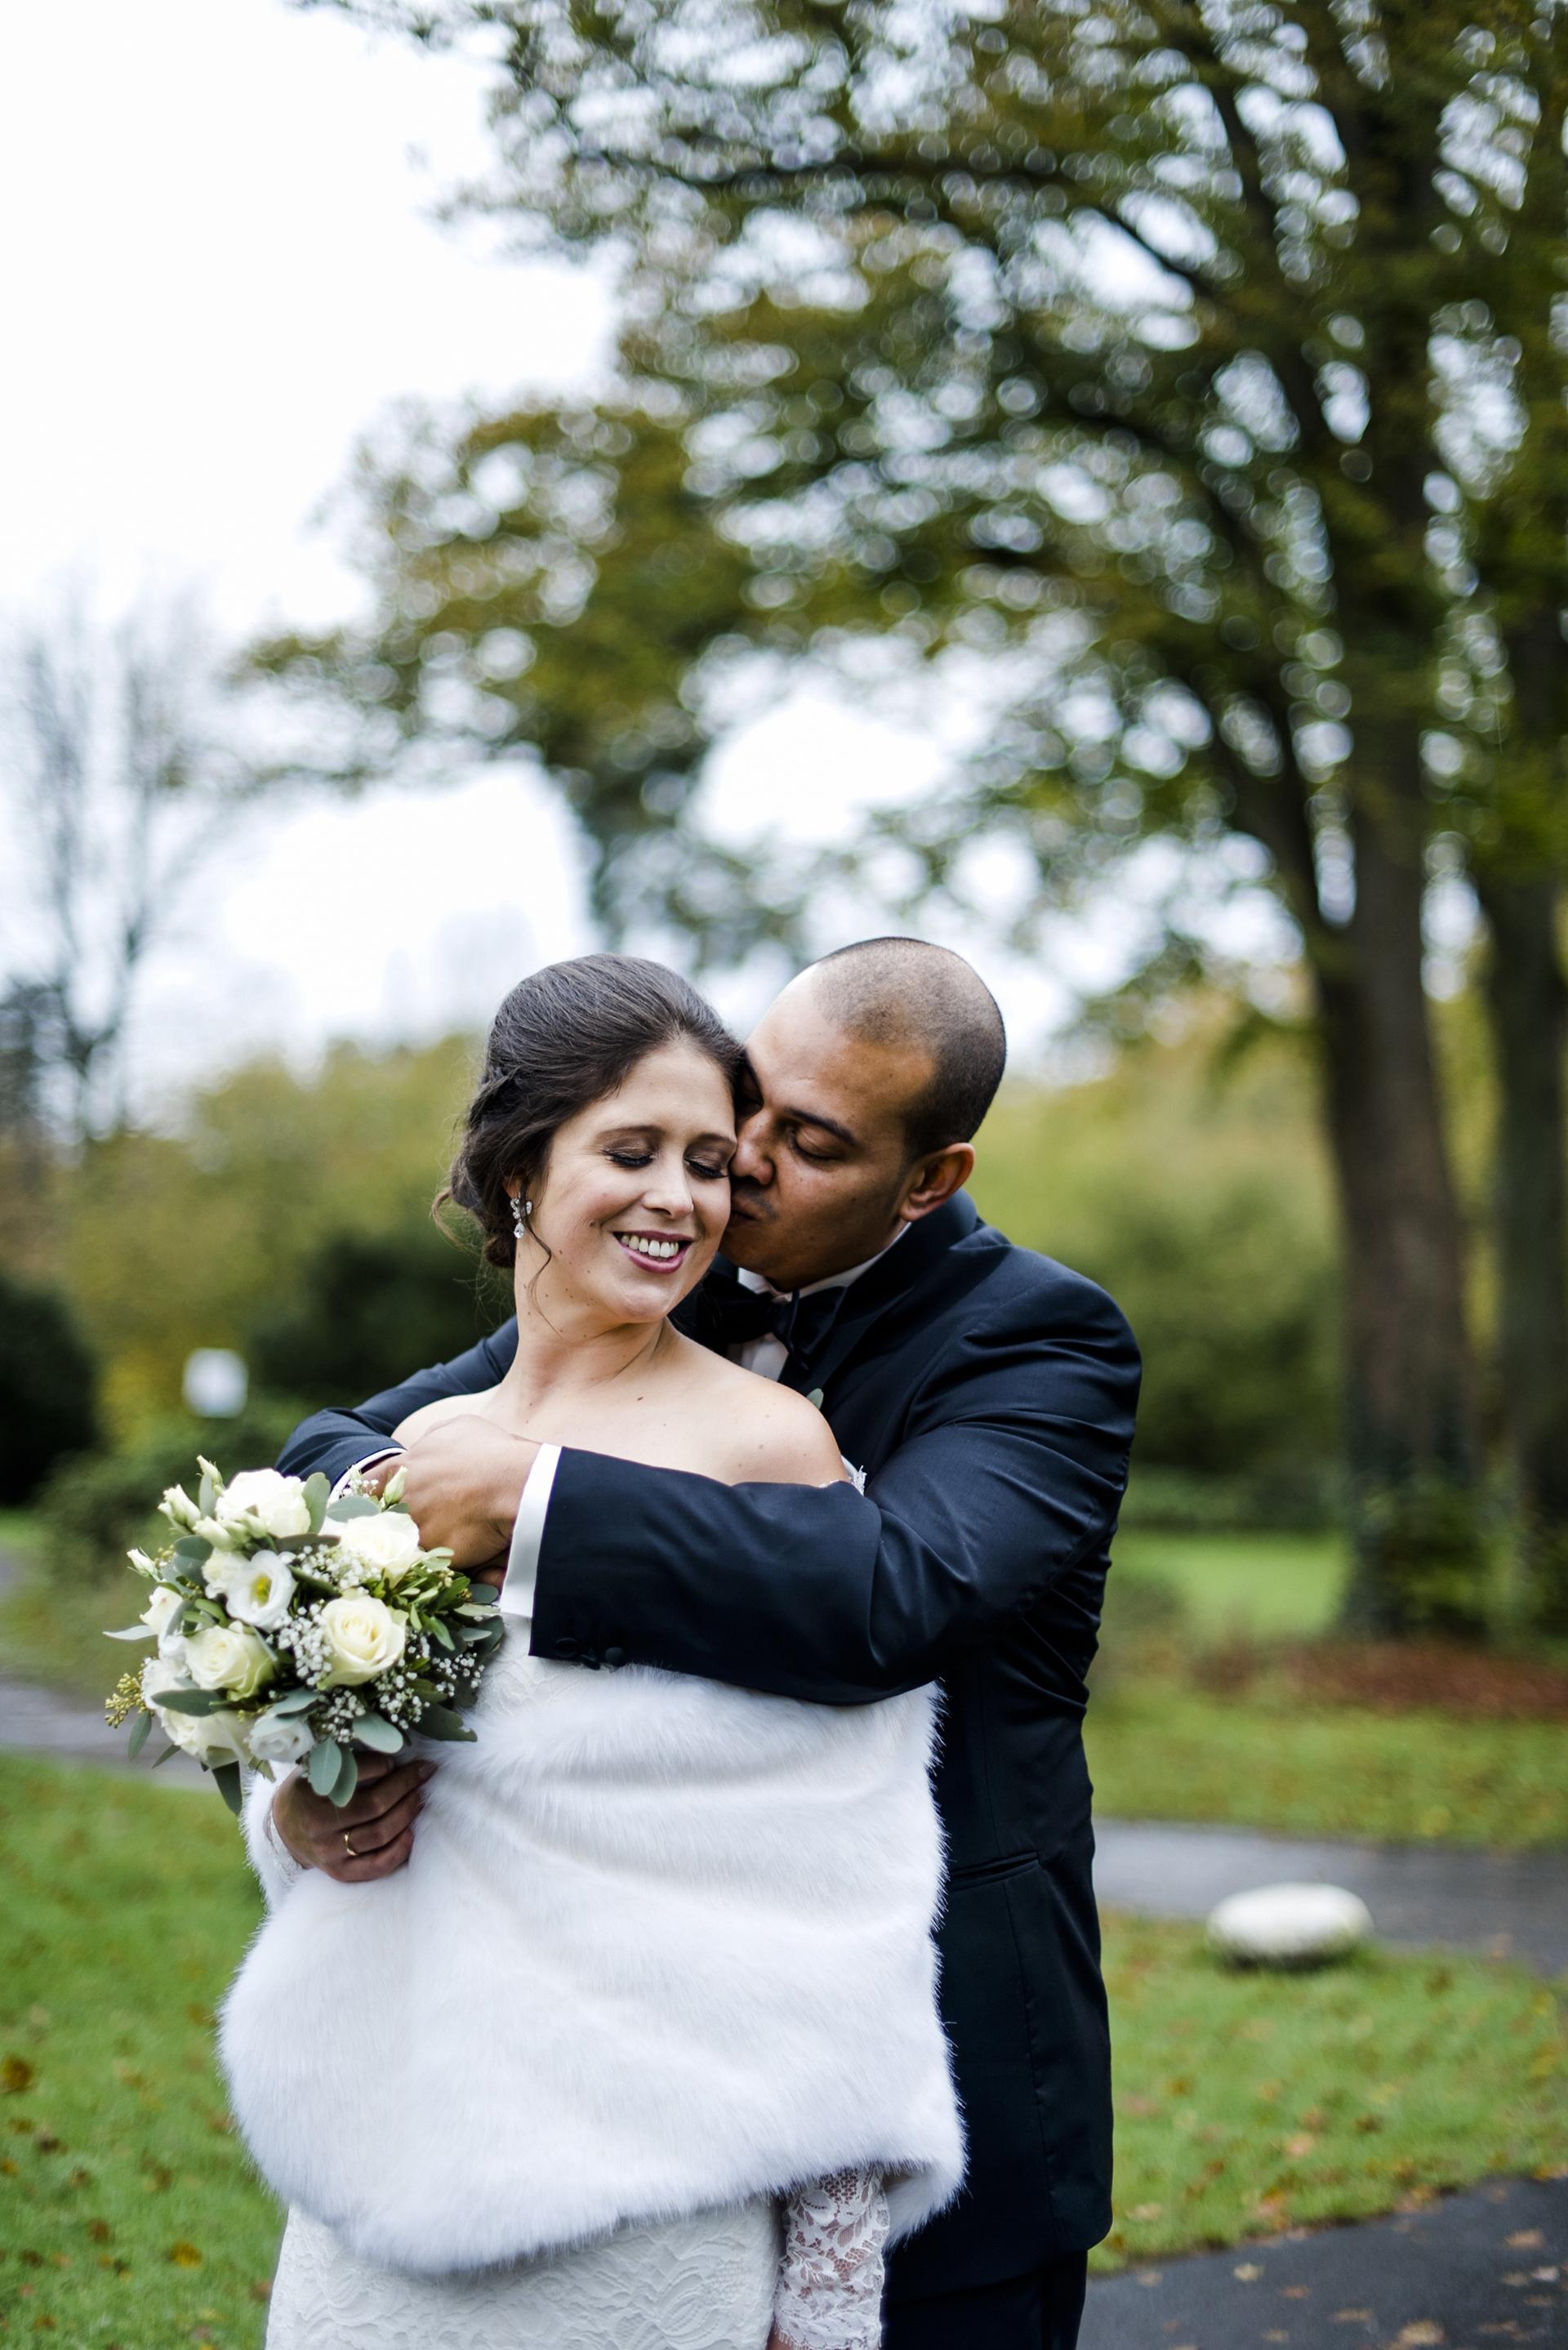 Hochzeitsreportage_J&D_067_Caroline Queda Fotografie